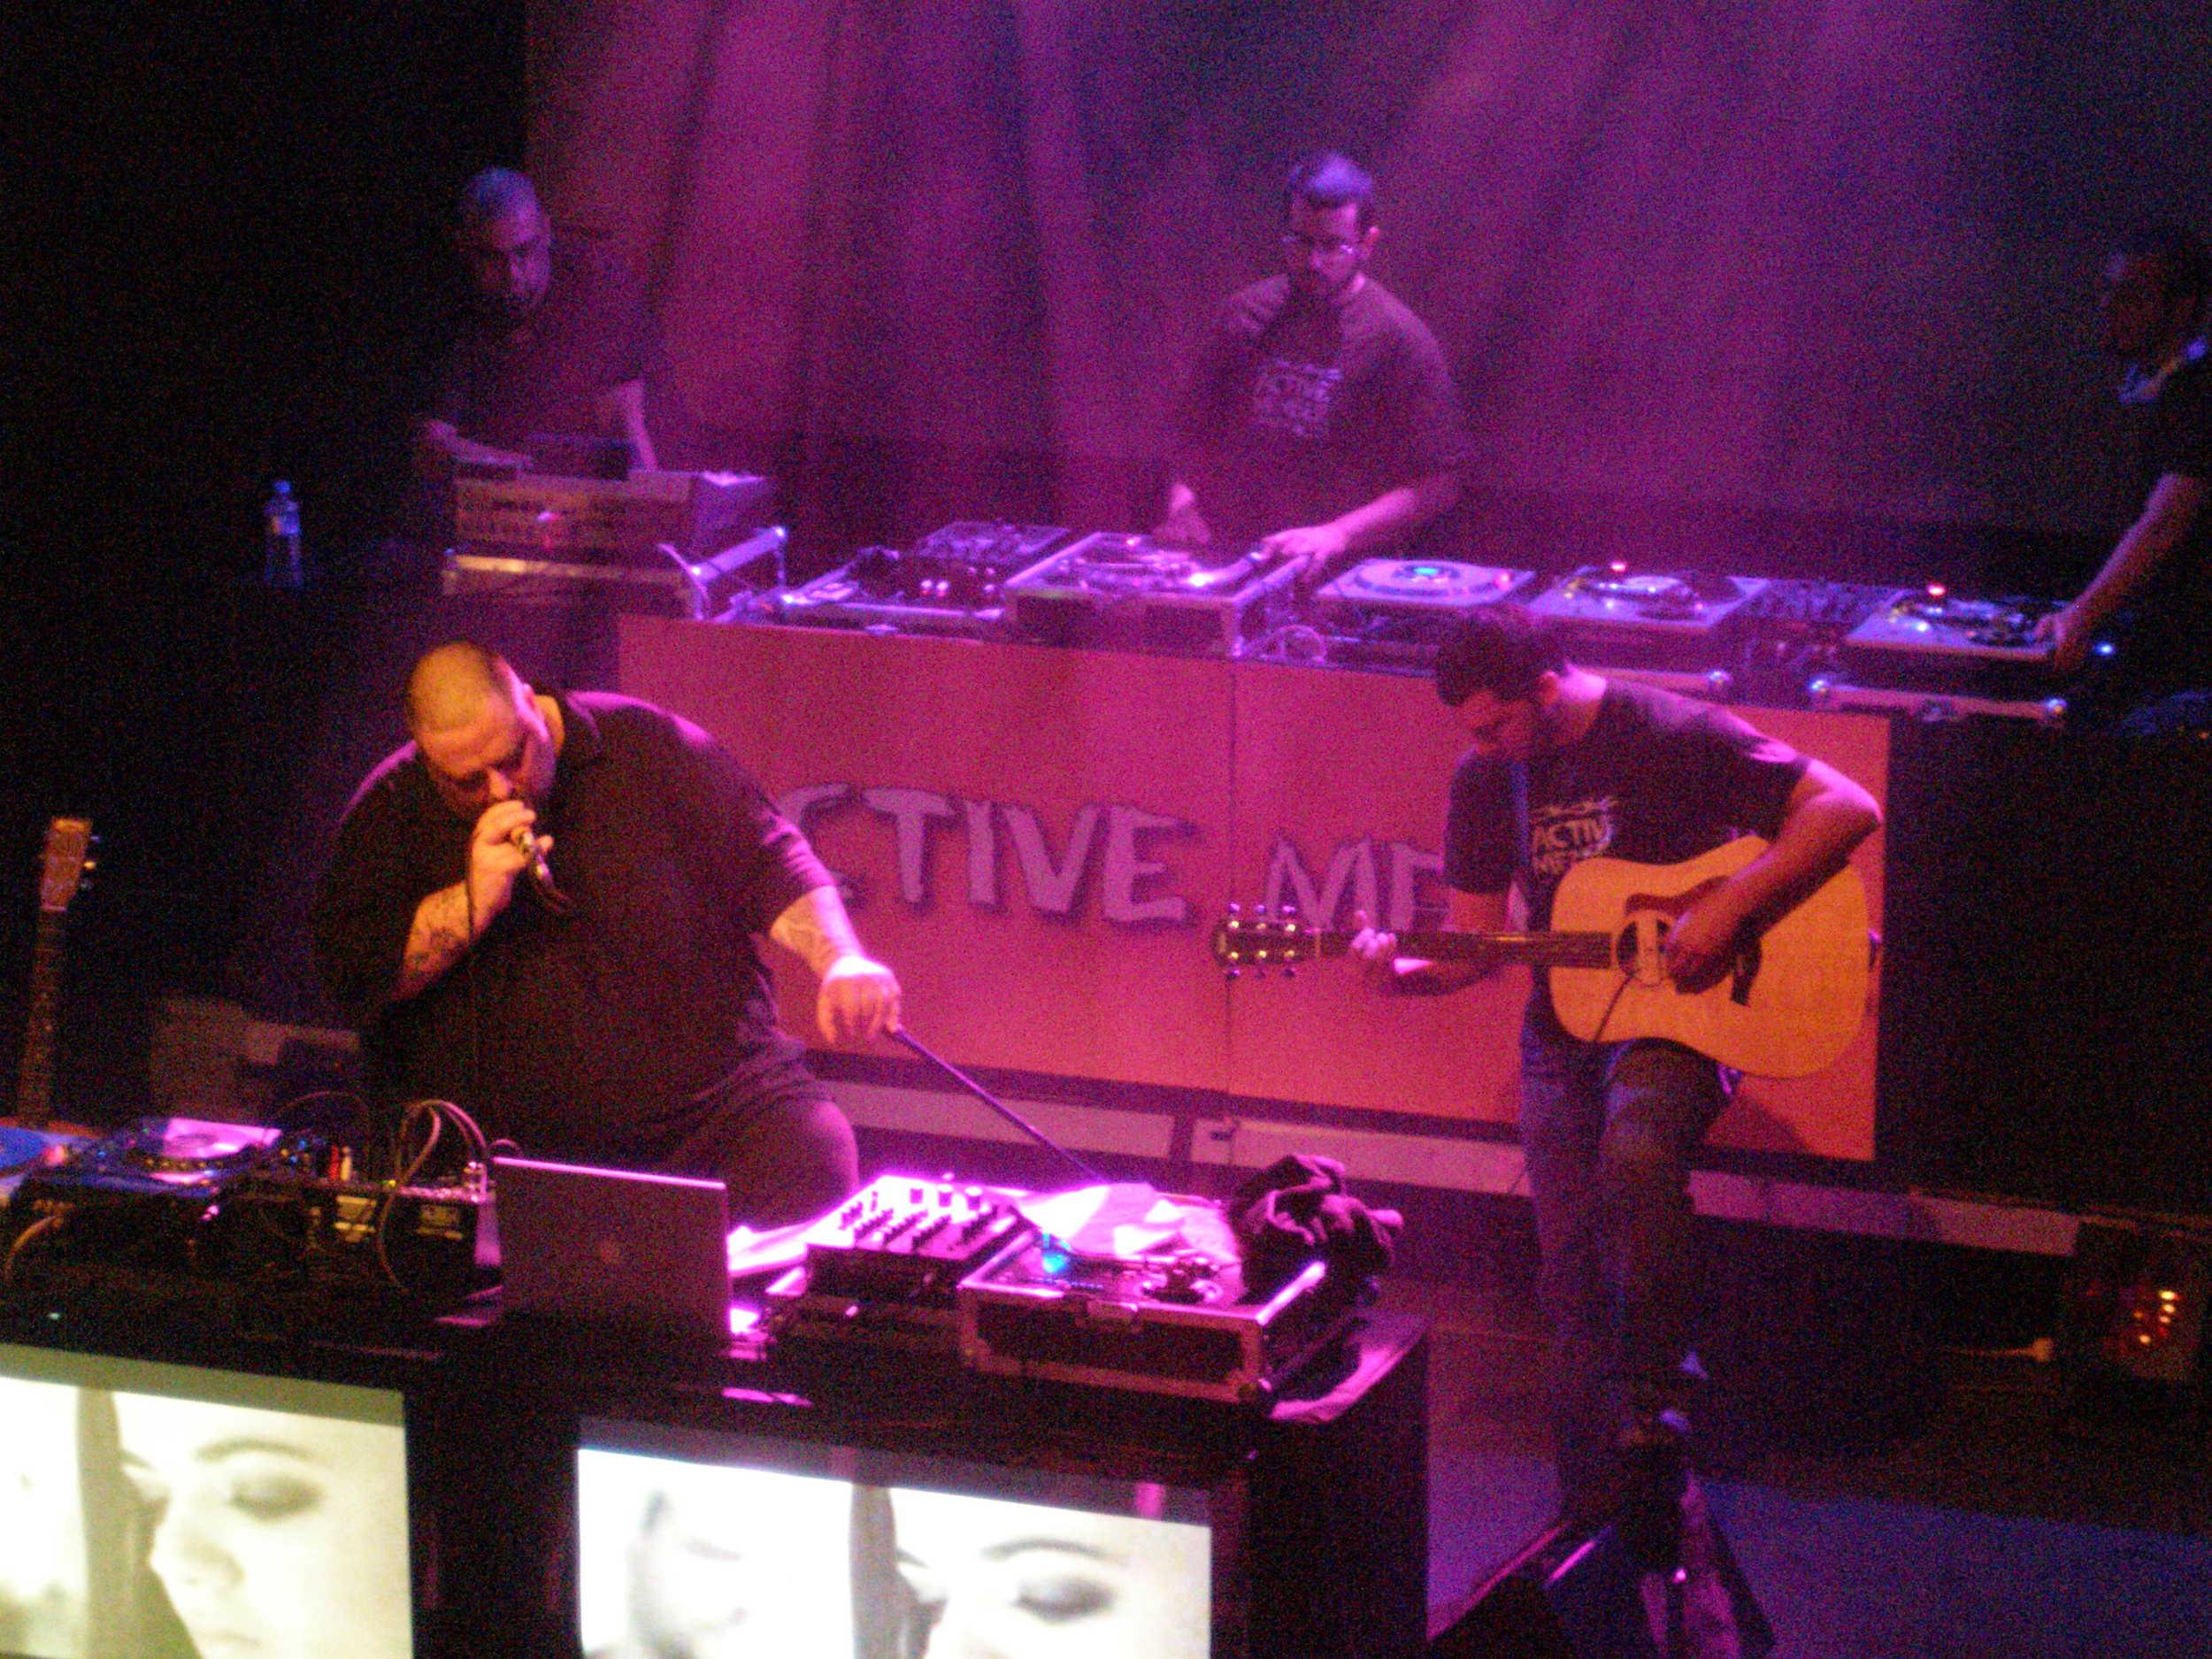 Active Member live - Gagarin, Athens